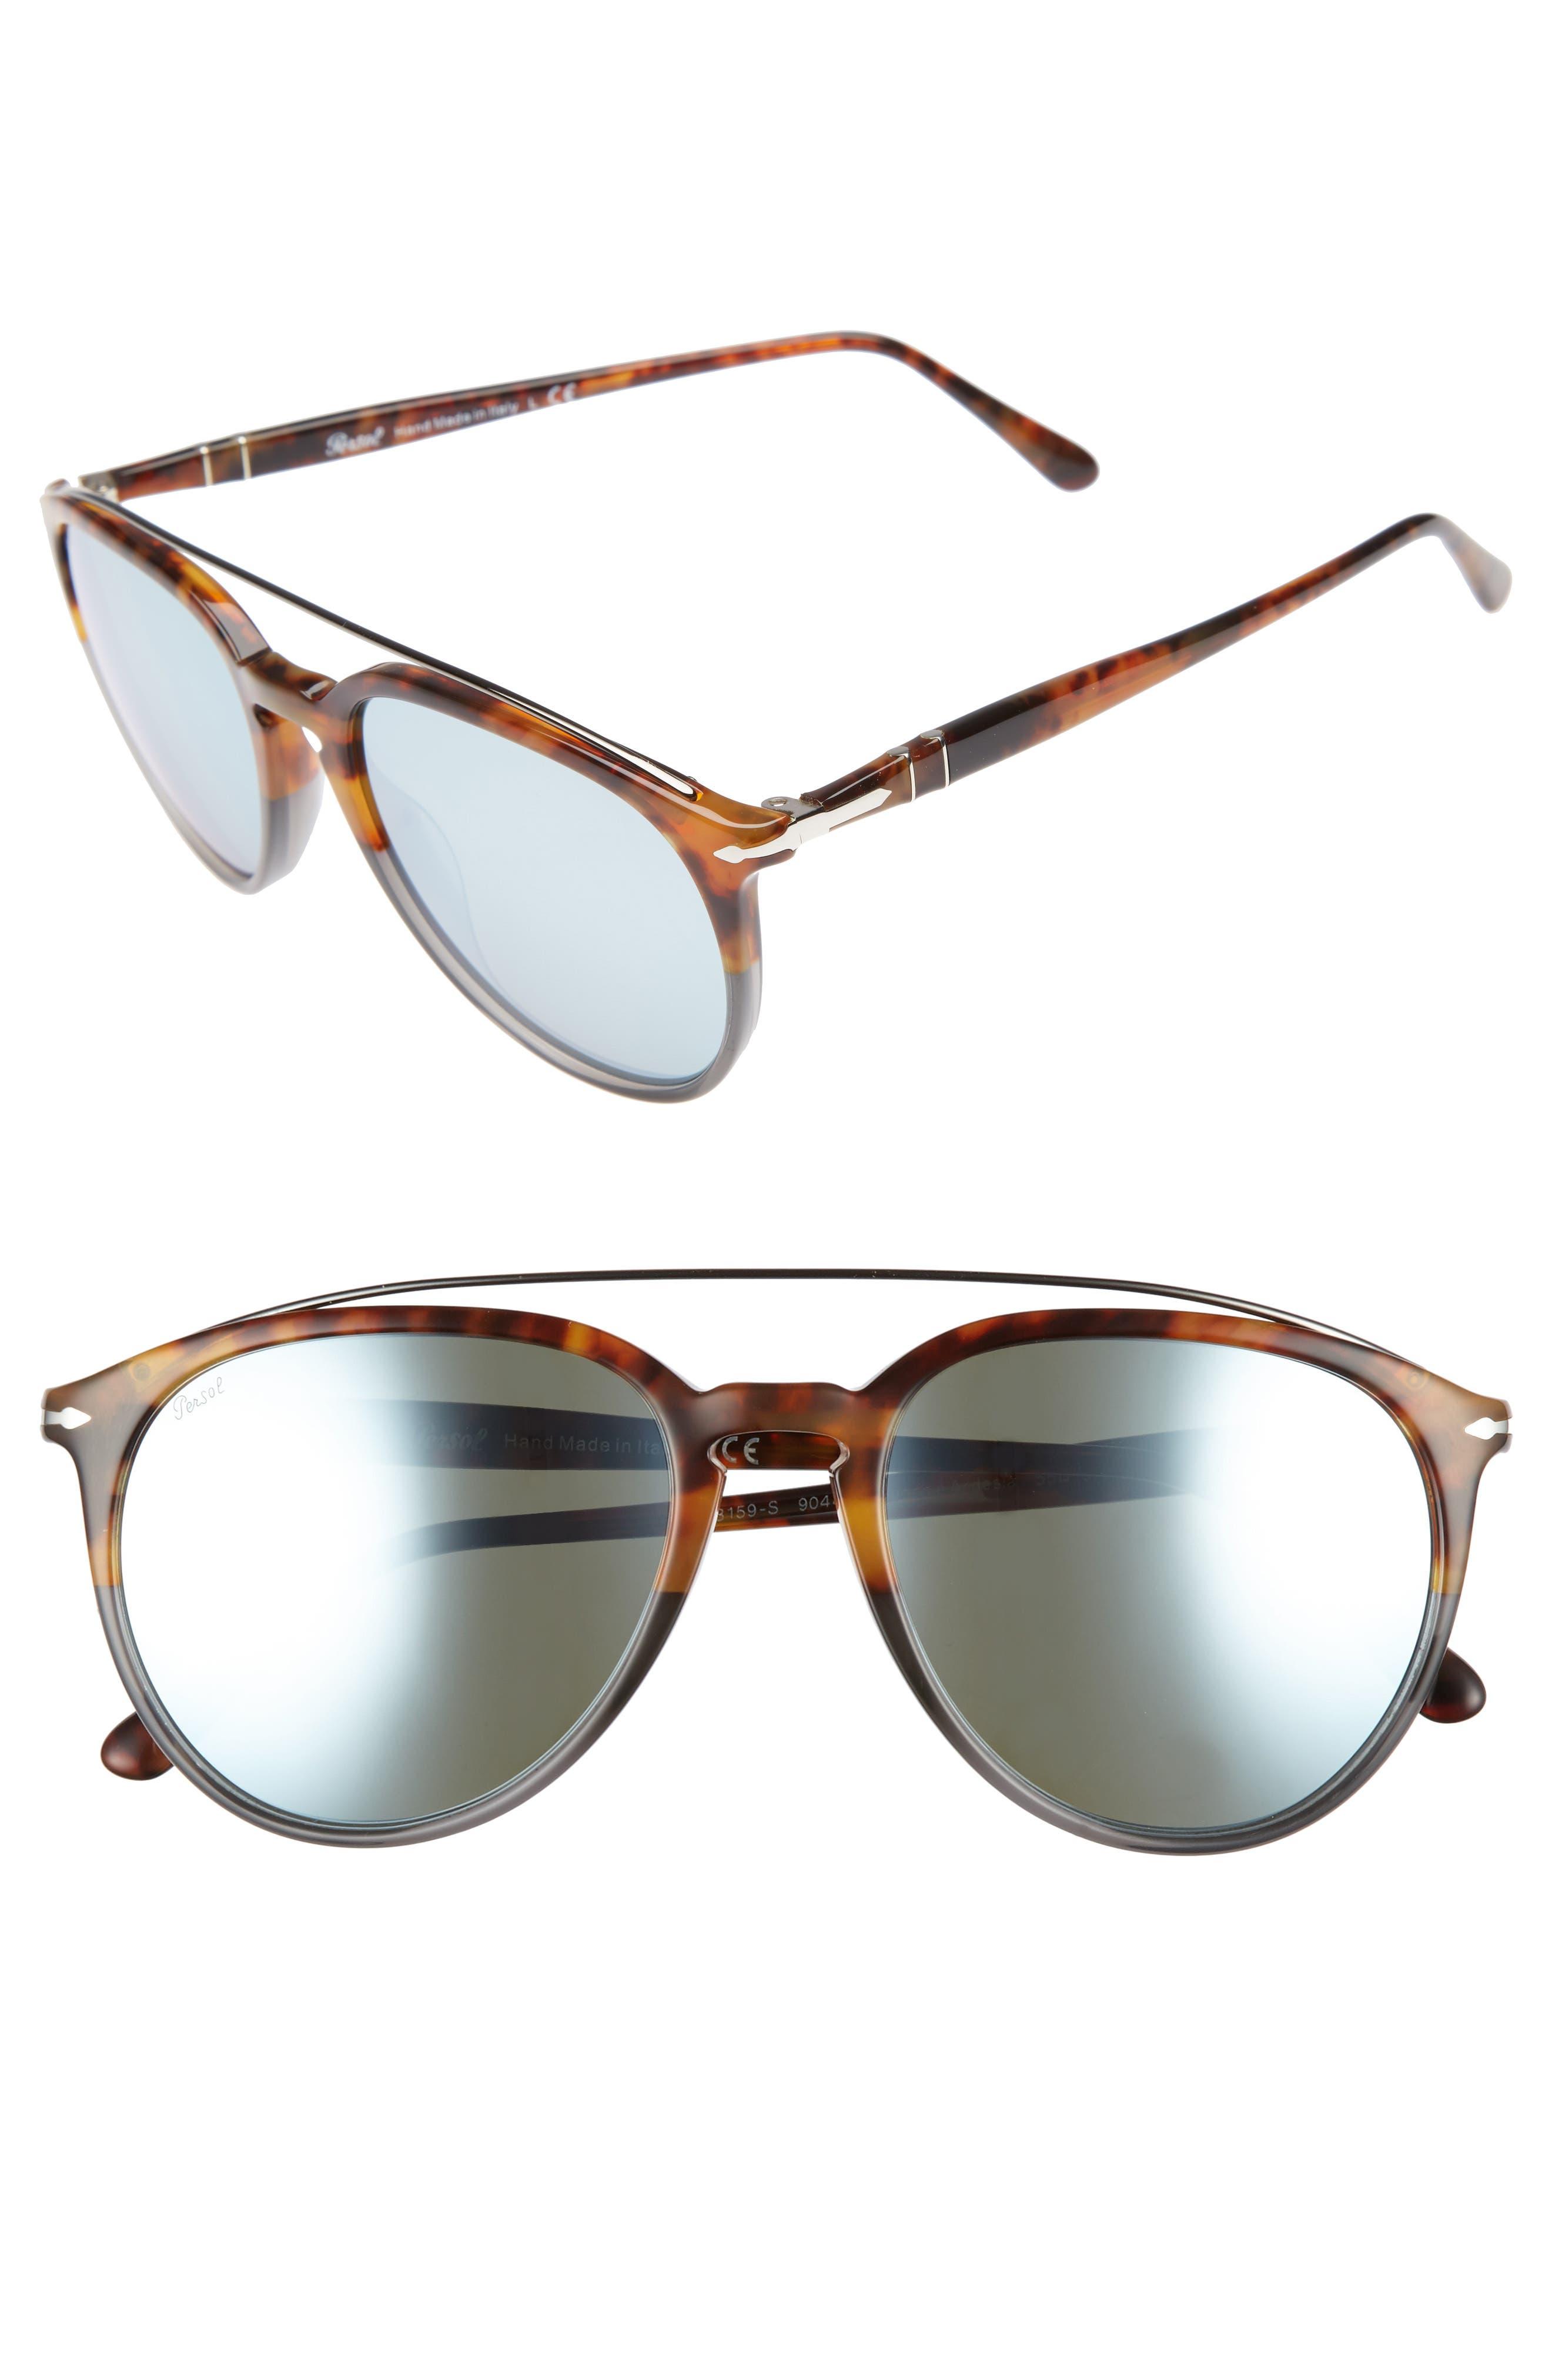 Sartoria 55mm Polarized Sunglasses,                             Main thumbnail 1, color,                             Fuoco E Ardesia/ Green Mirror